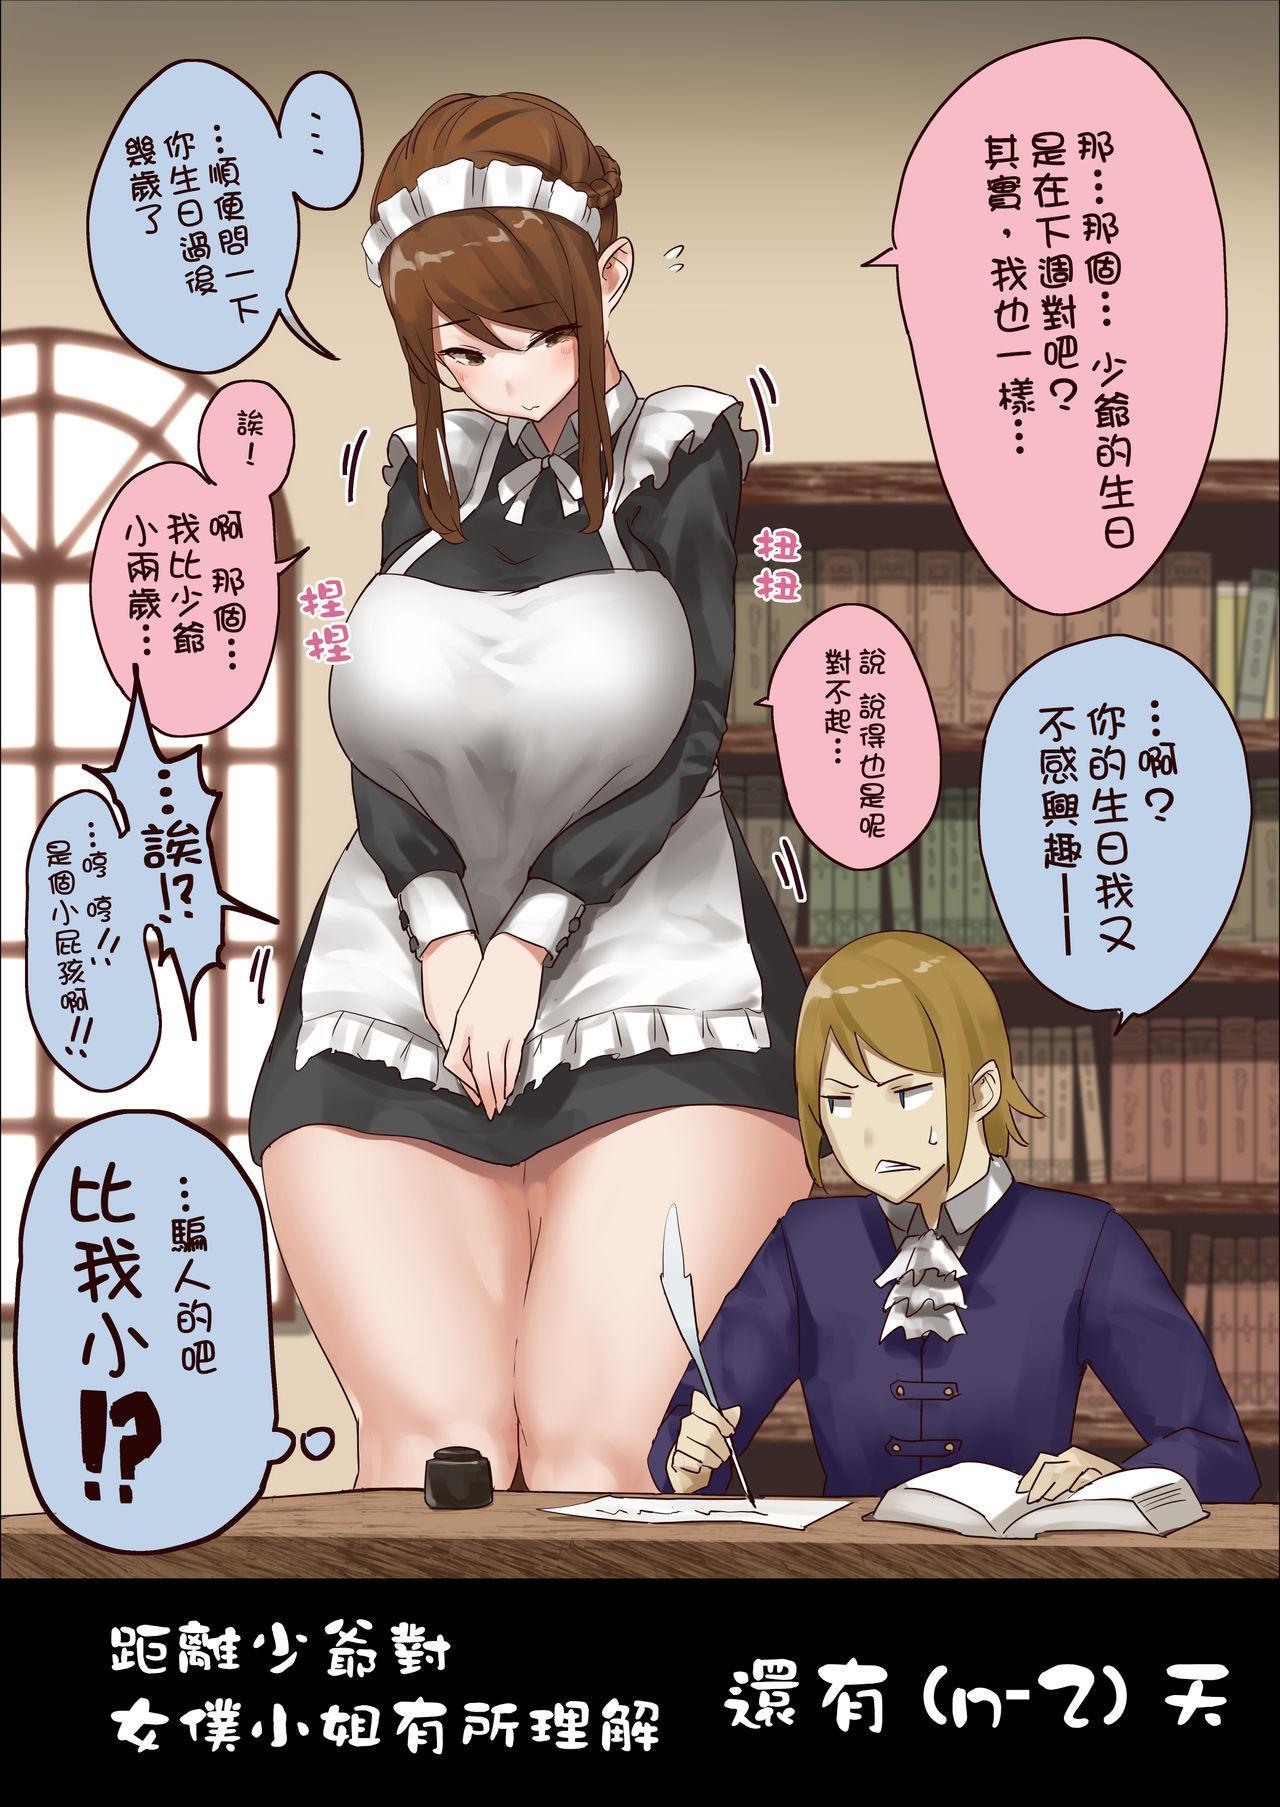 n-nichigo ni Wakaraserareru Bocchama | 距離少爺對女僕小姐有所理解還有n天 3